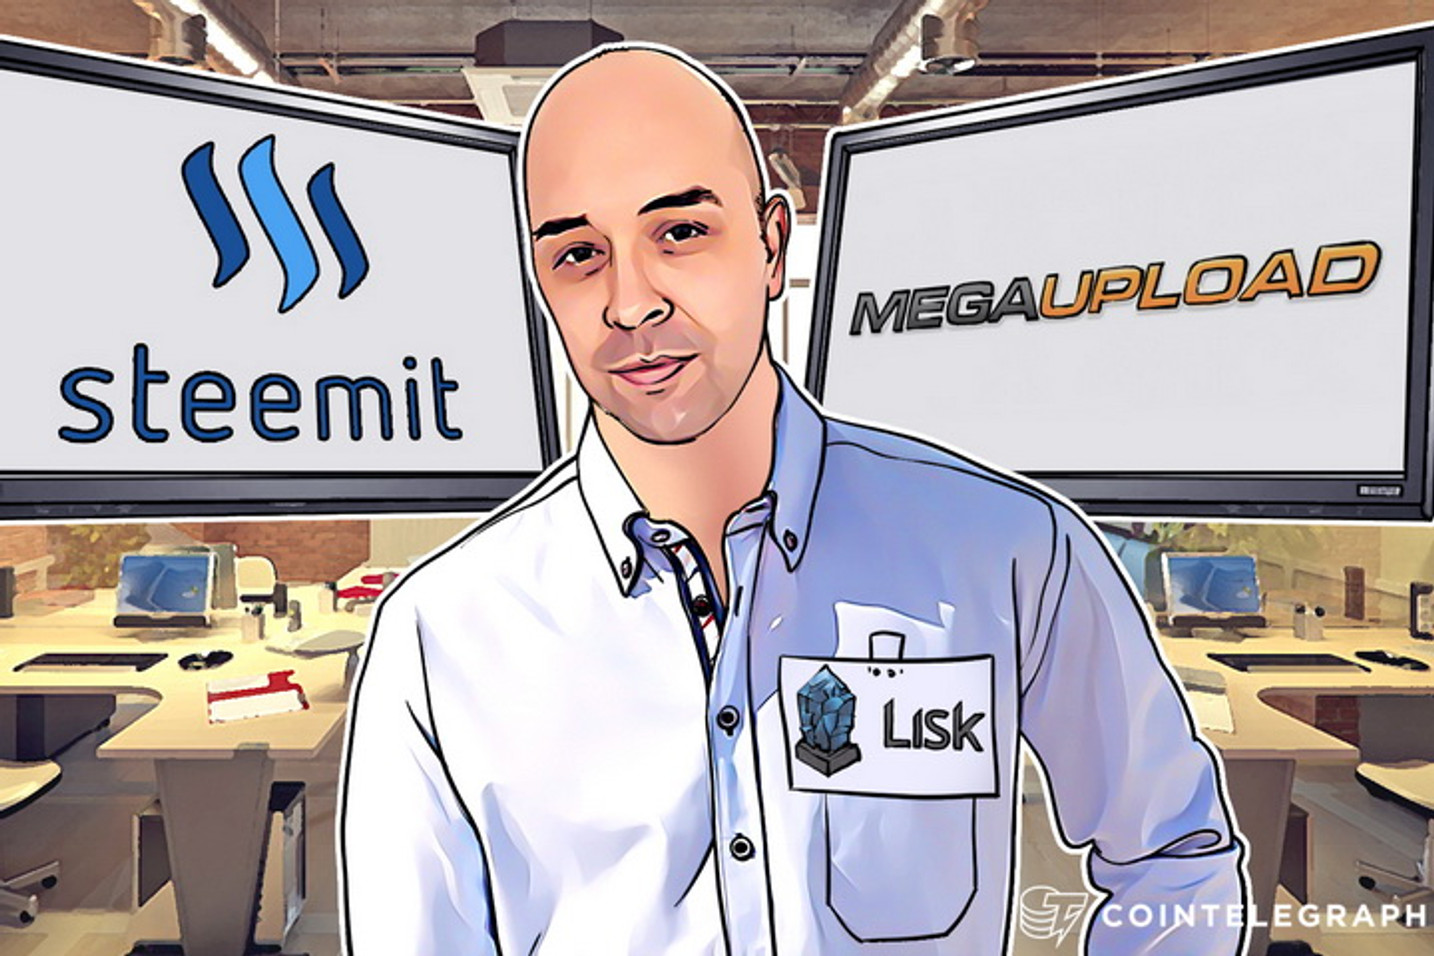 Lisk Blockchain Platform Could Host Megaupload 2.0 and Steemit